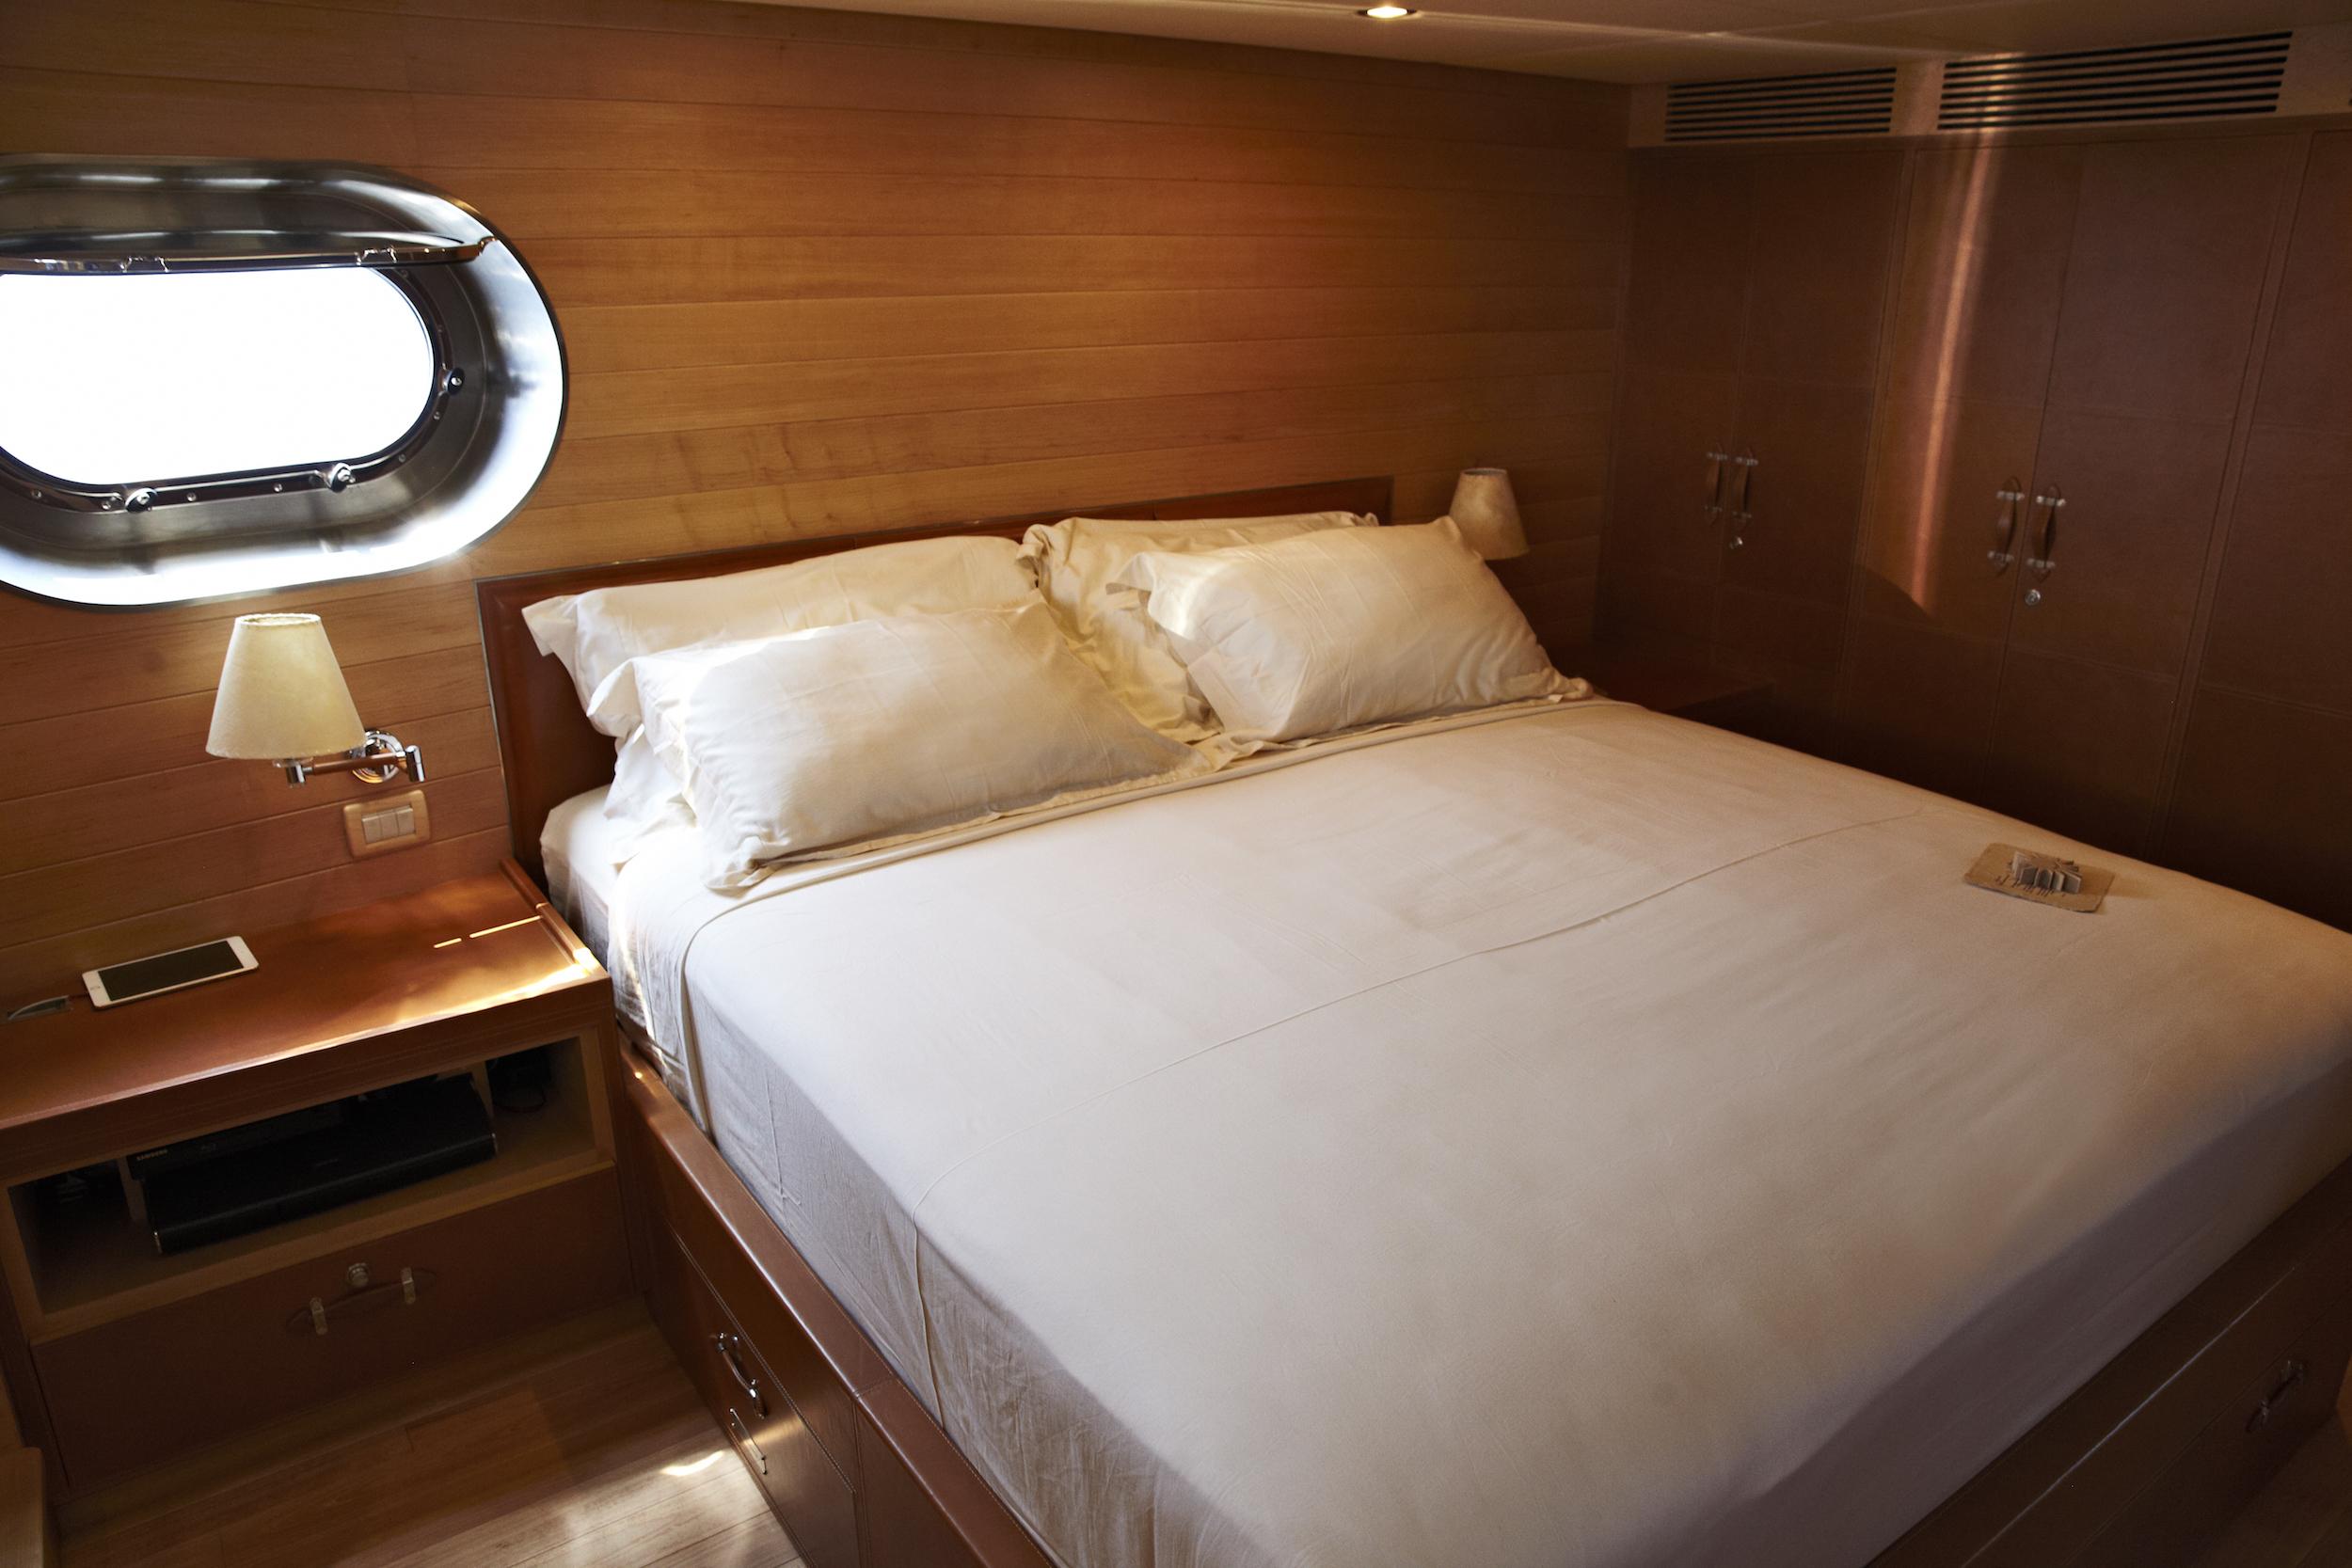 008-SA-Soneva_in_Aqua_Guest_bedroom_by_Michael_Doster.jpg